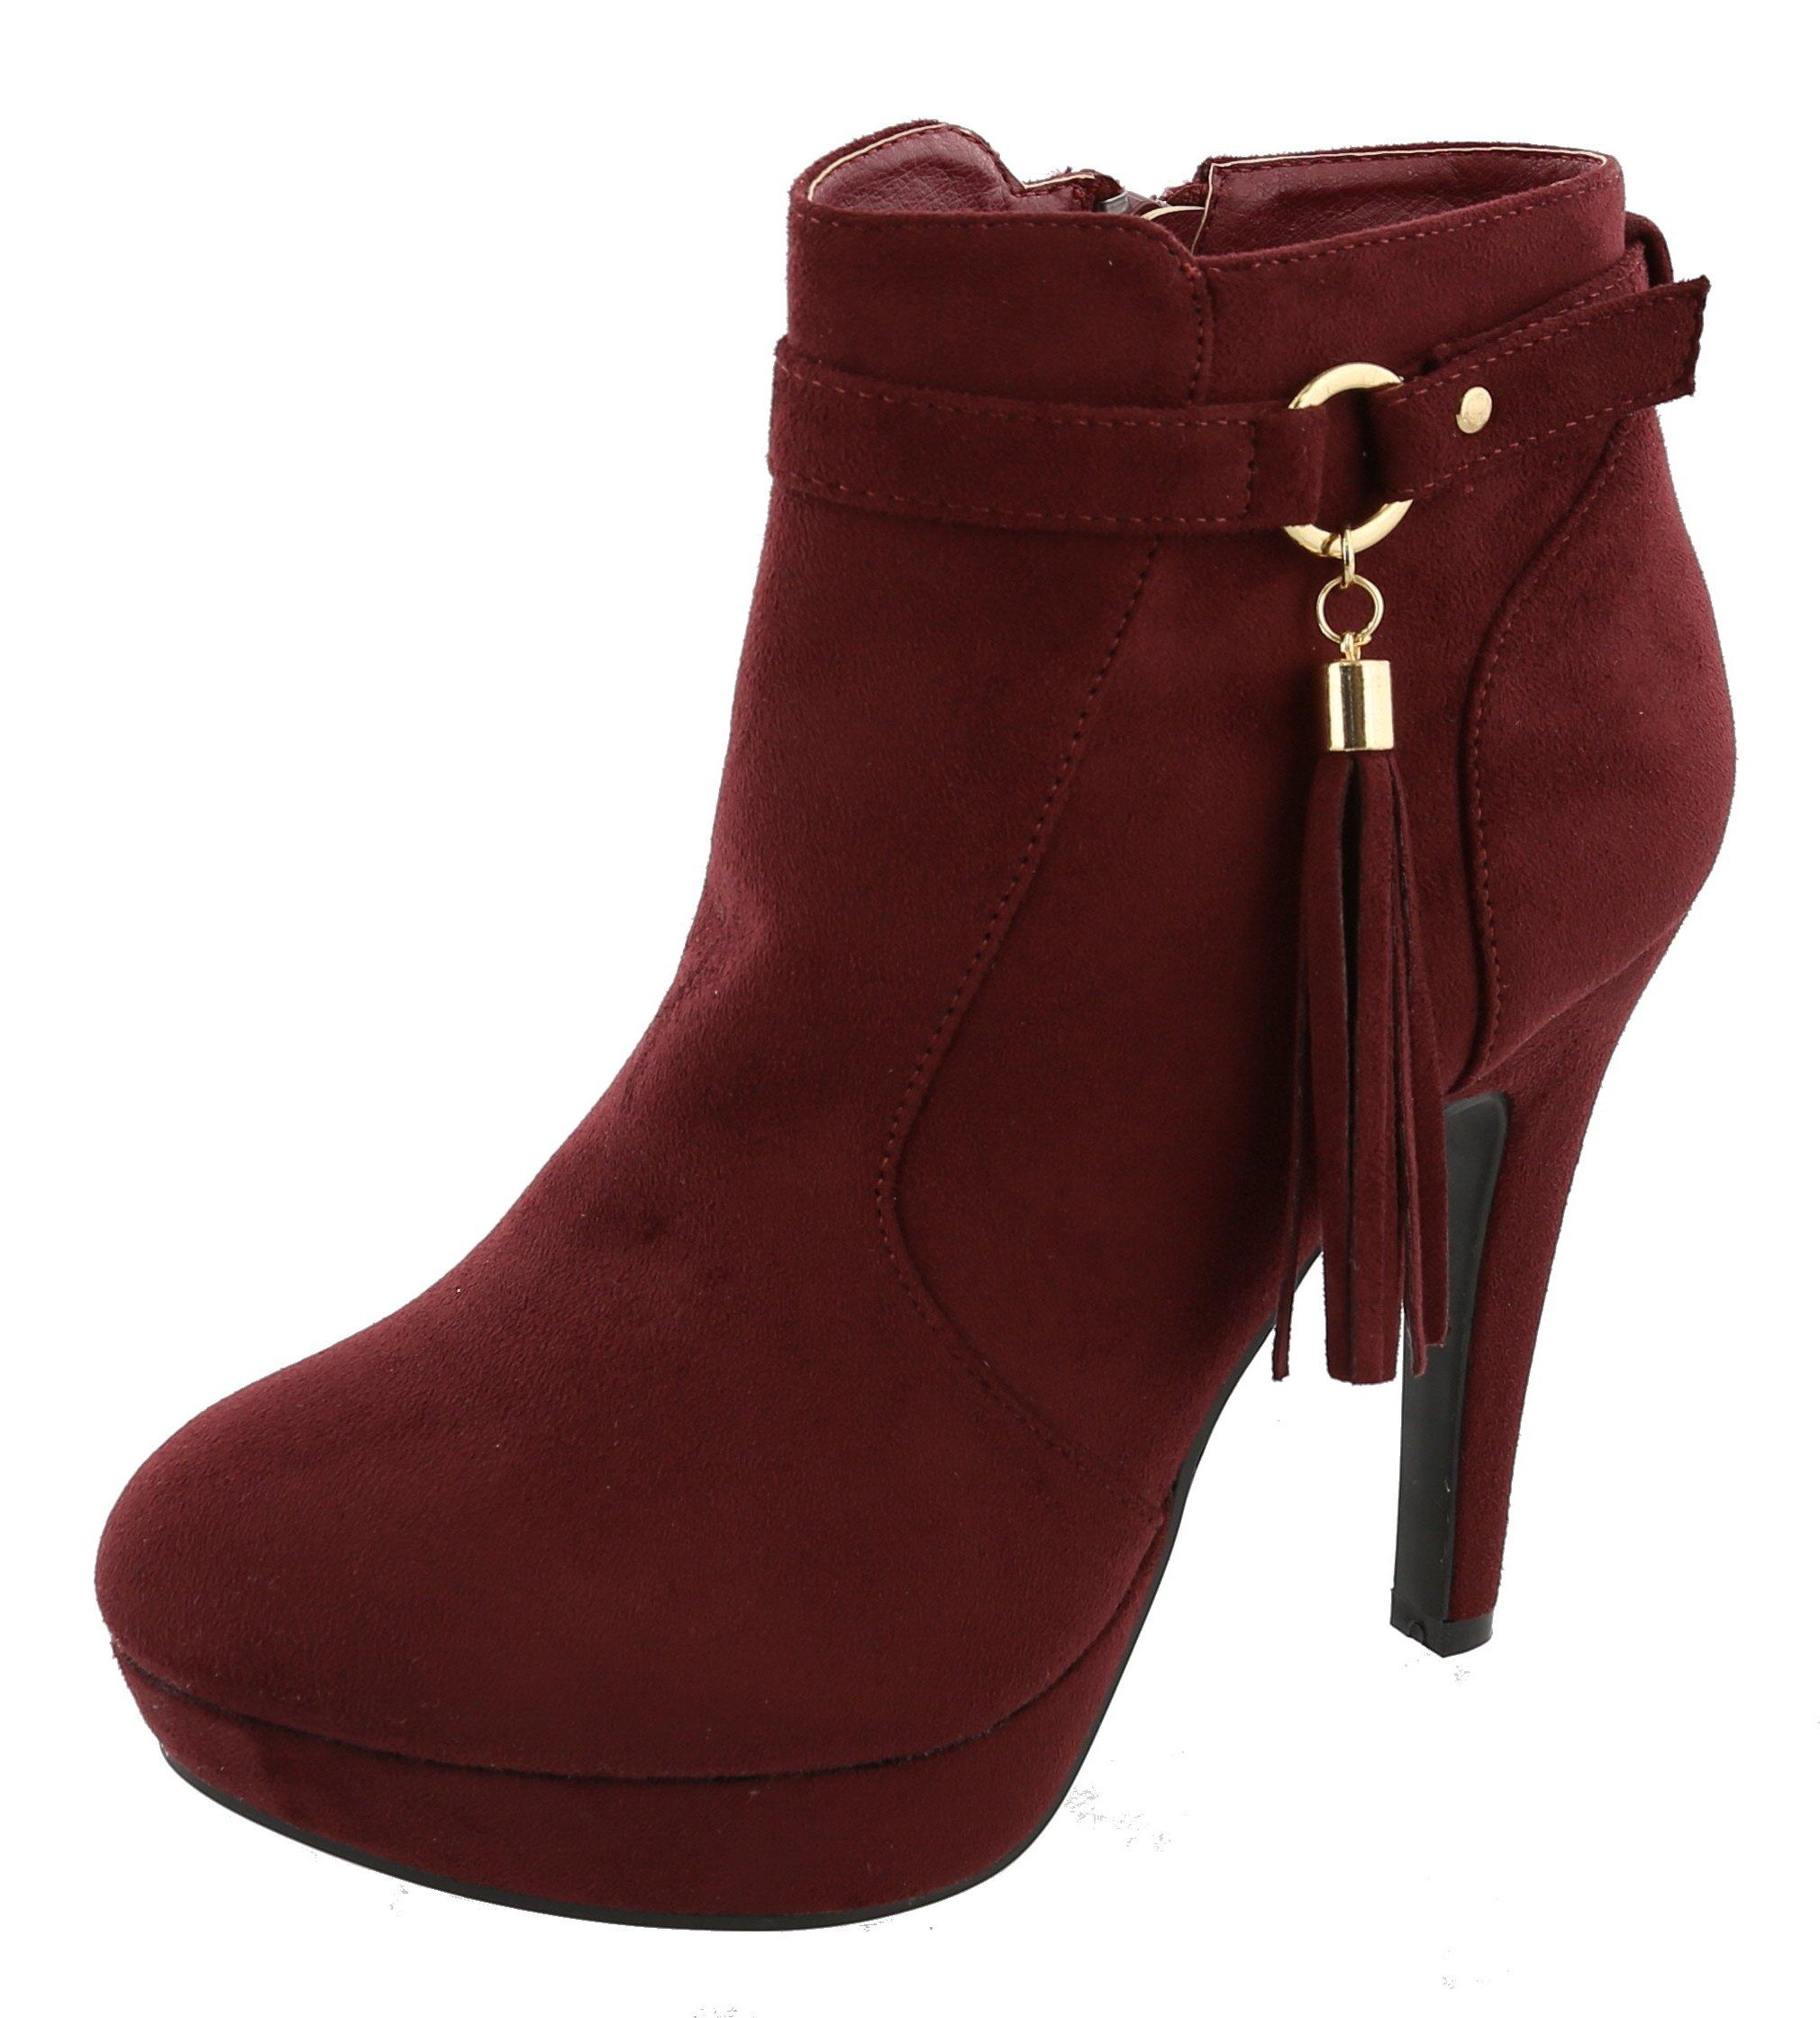 Top Moda Women's Closed Almond Toe Tassel Platform Stiletto Heel Ankle Bootie (8.5 B(M) US, Wine)